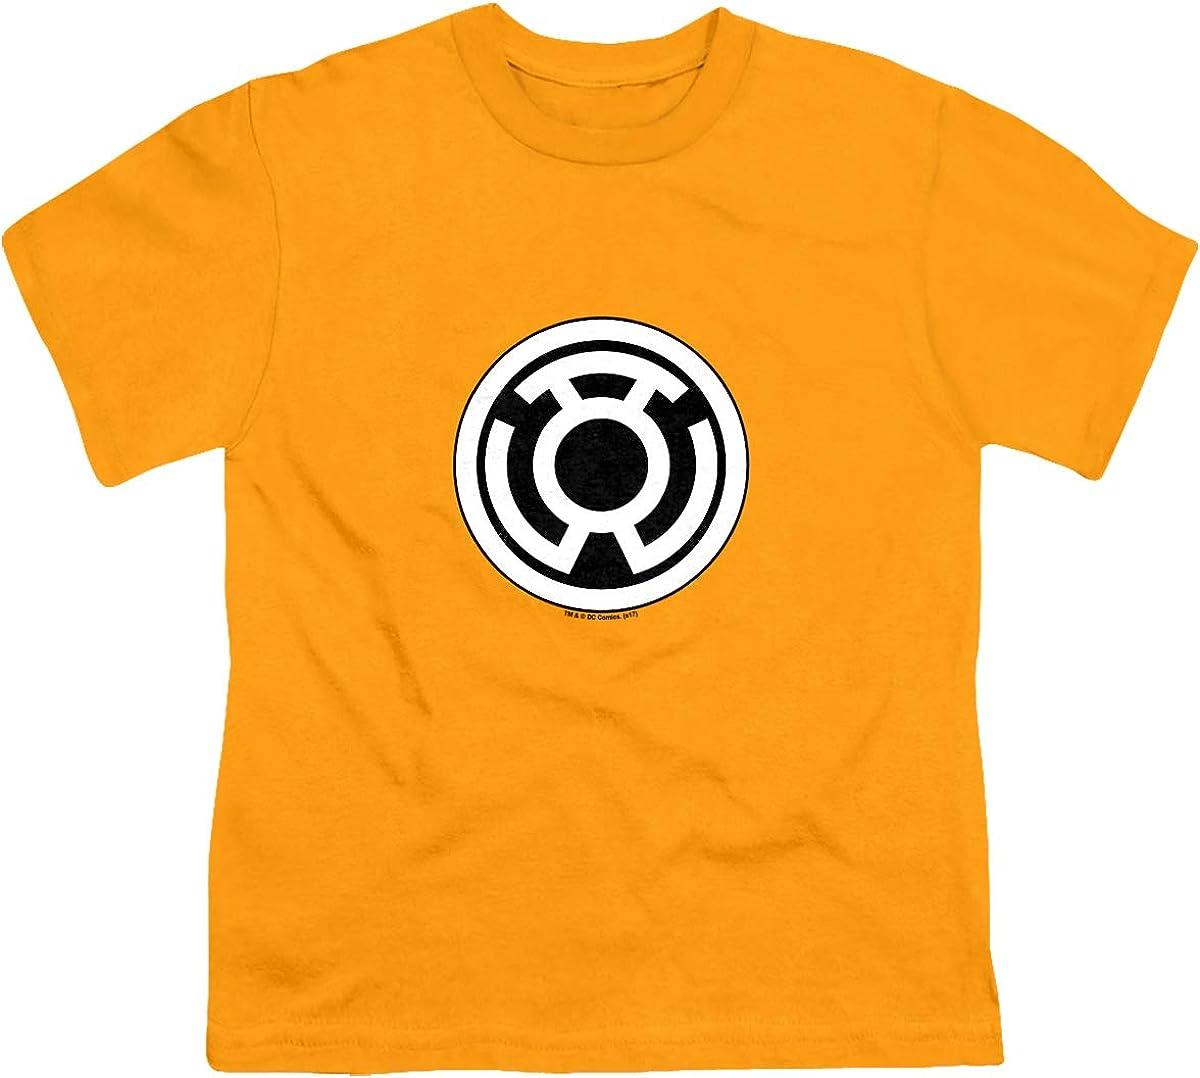 Green Lantern Sinestro Corps Logo Unisex Youth T Shirt, Gold, X-Large